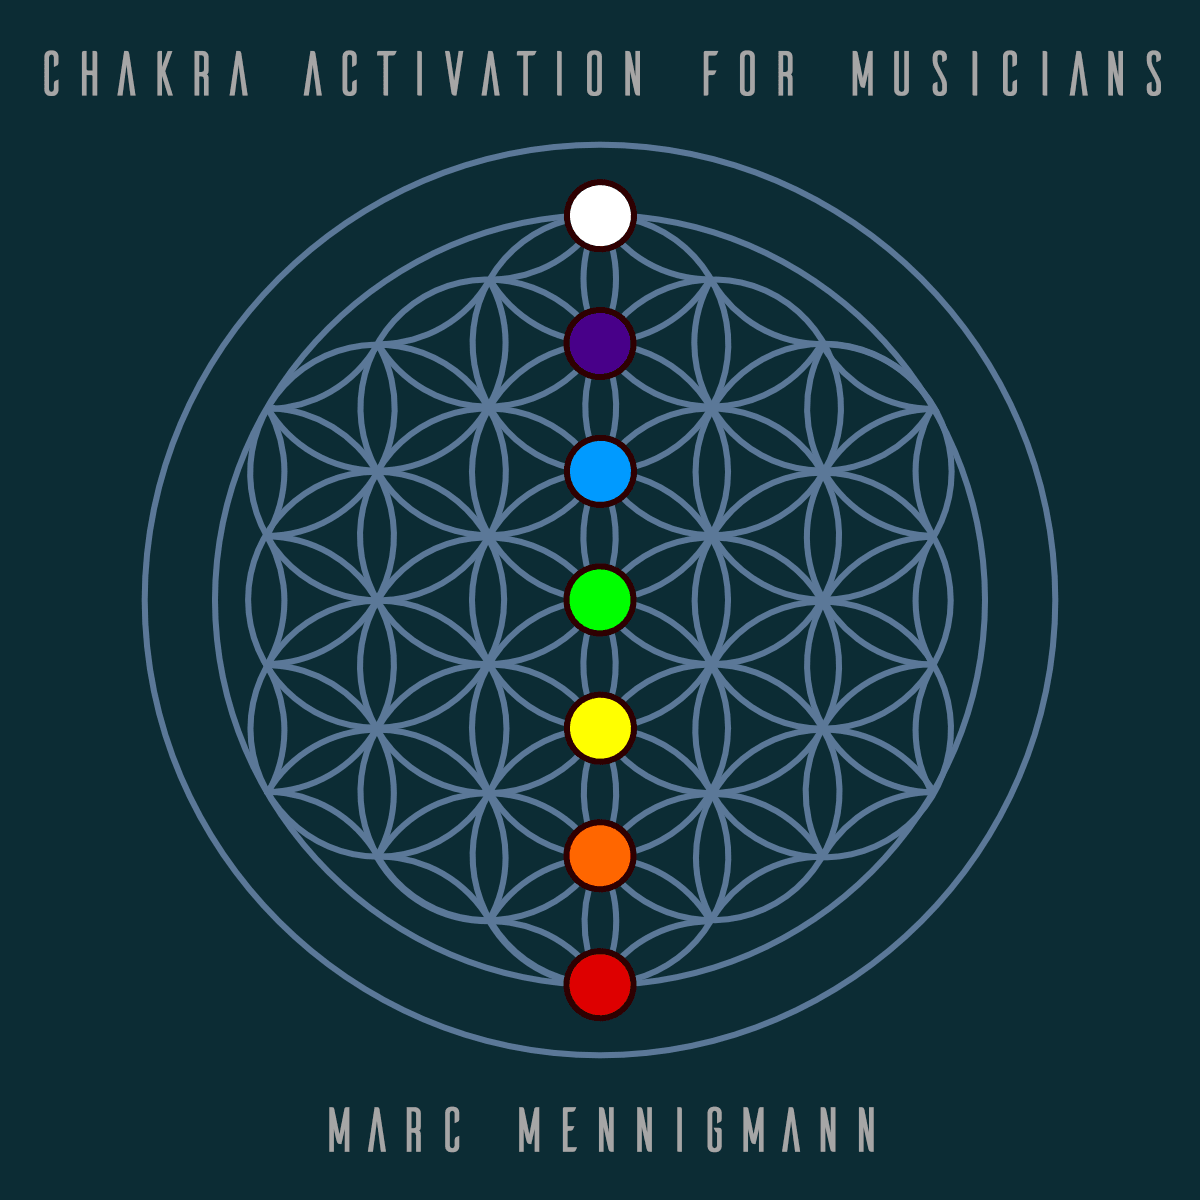 Meditation Music for Musicians - mennigmann com